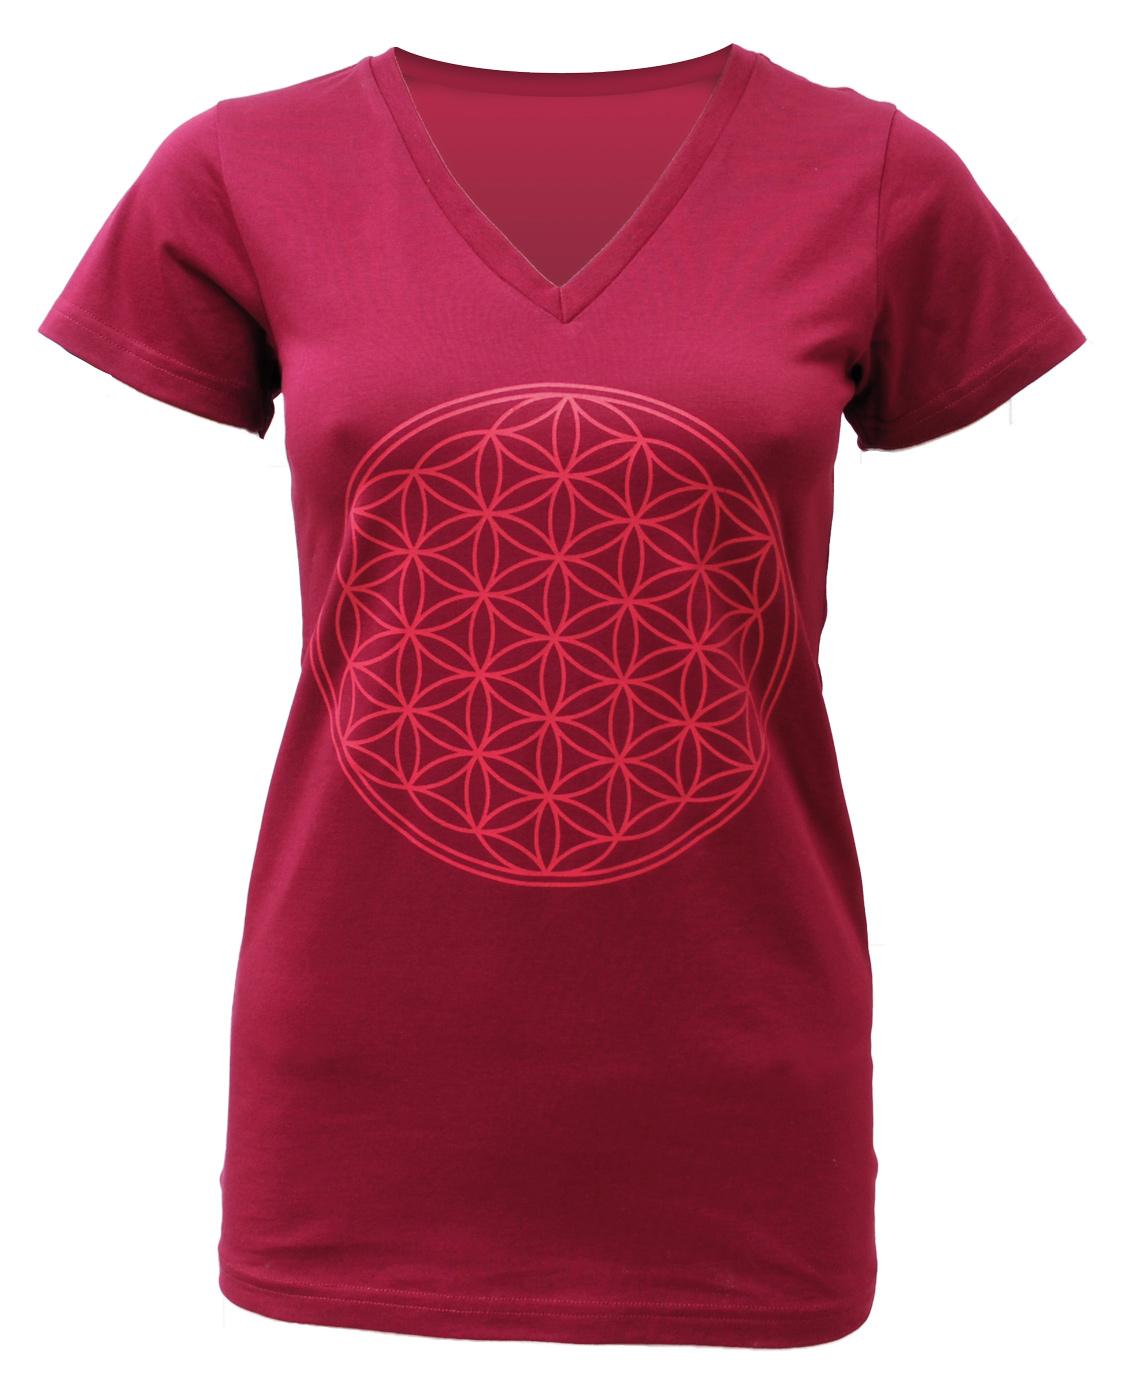 "Yoga-T-Shirt ""Flower of Life"" - bordeaux"